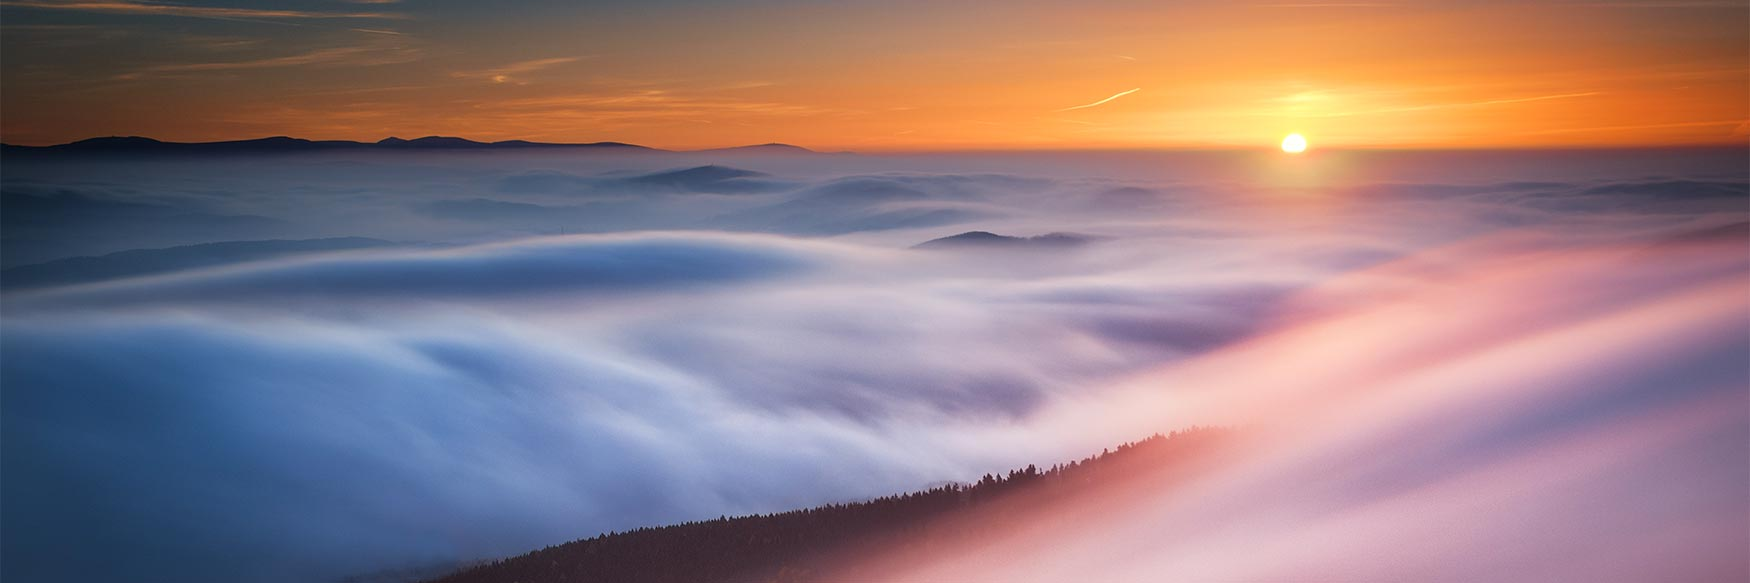 Sunrise View from Ještěd, Liberec Region, Czechia